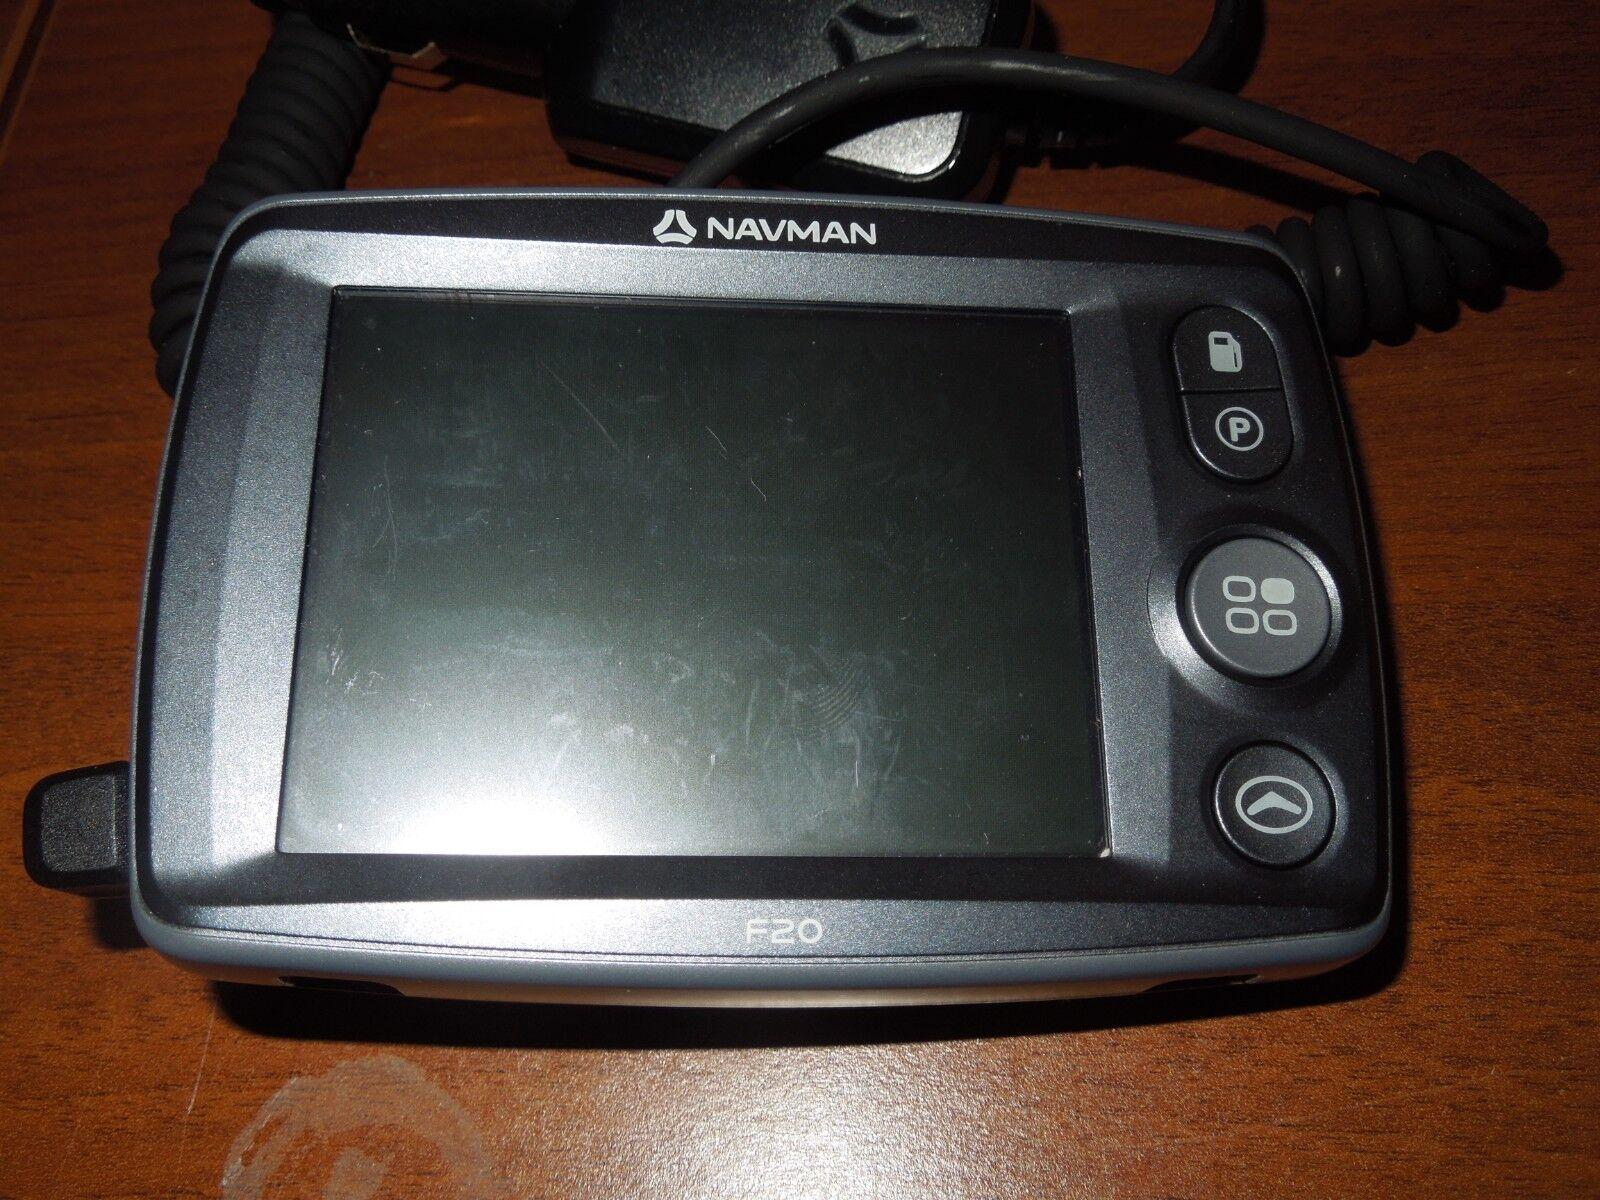 Navman Bundle F20 Slim, Portable GPS Navigation 3.5 inch Touch Screen with Case